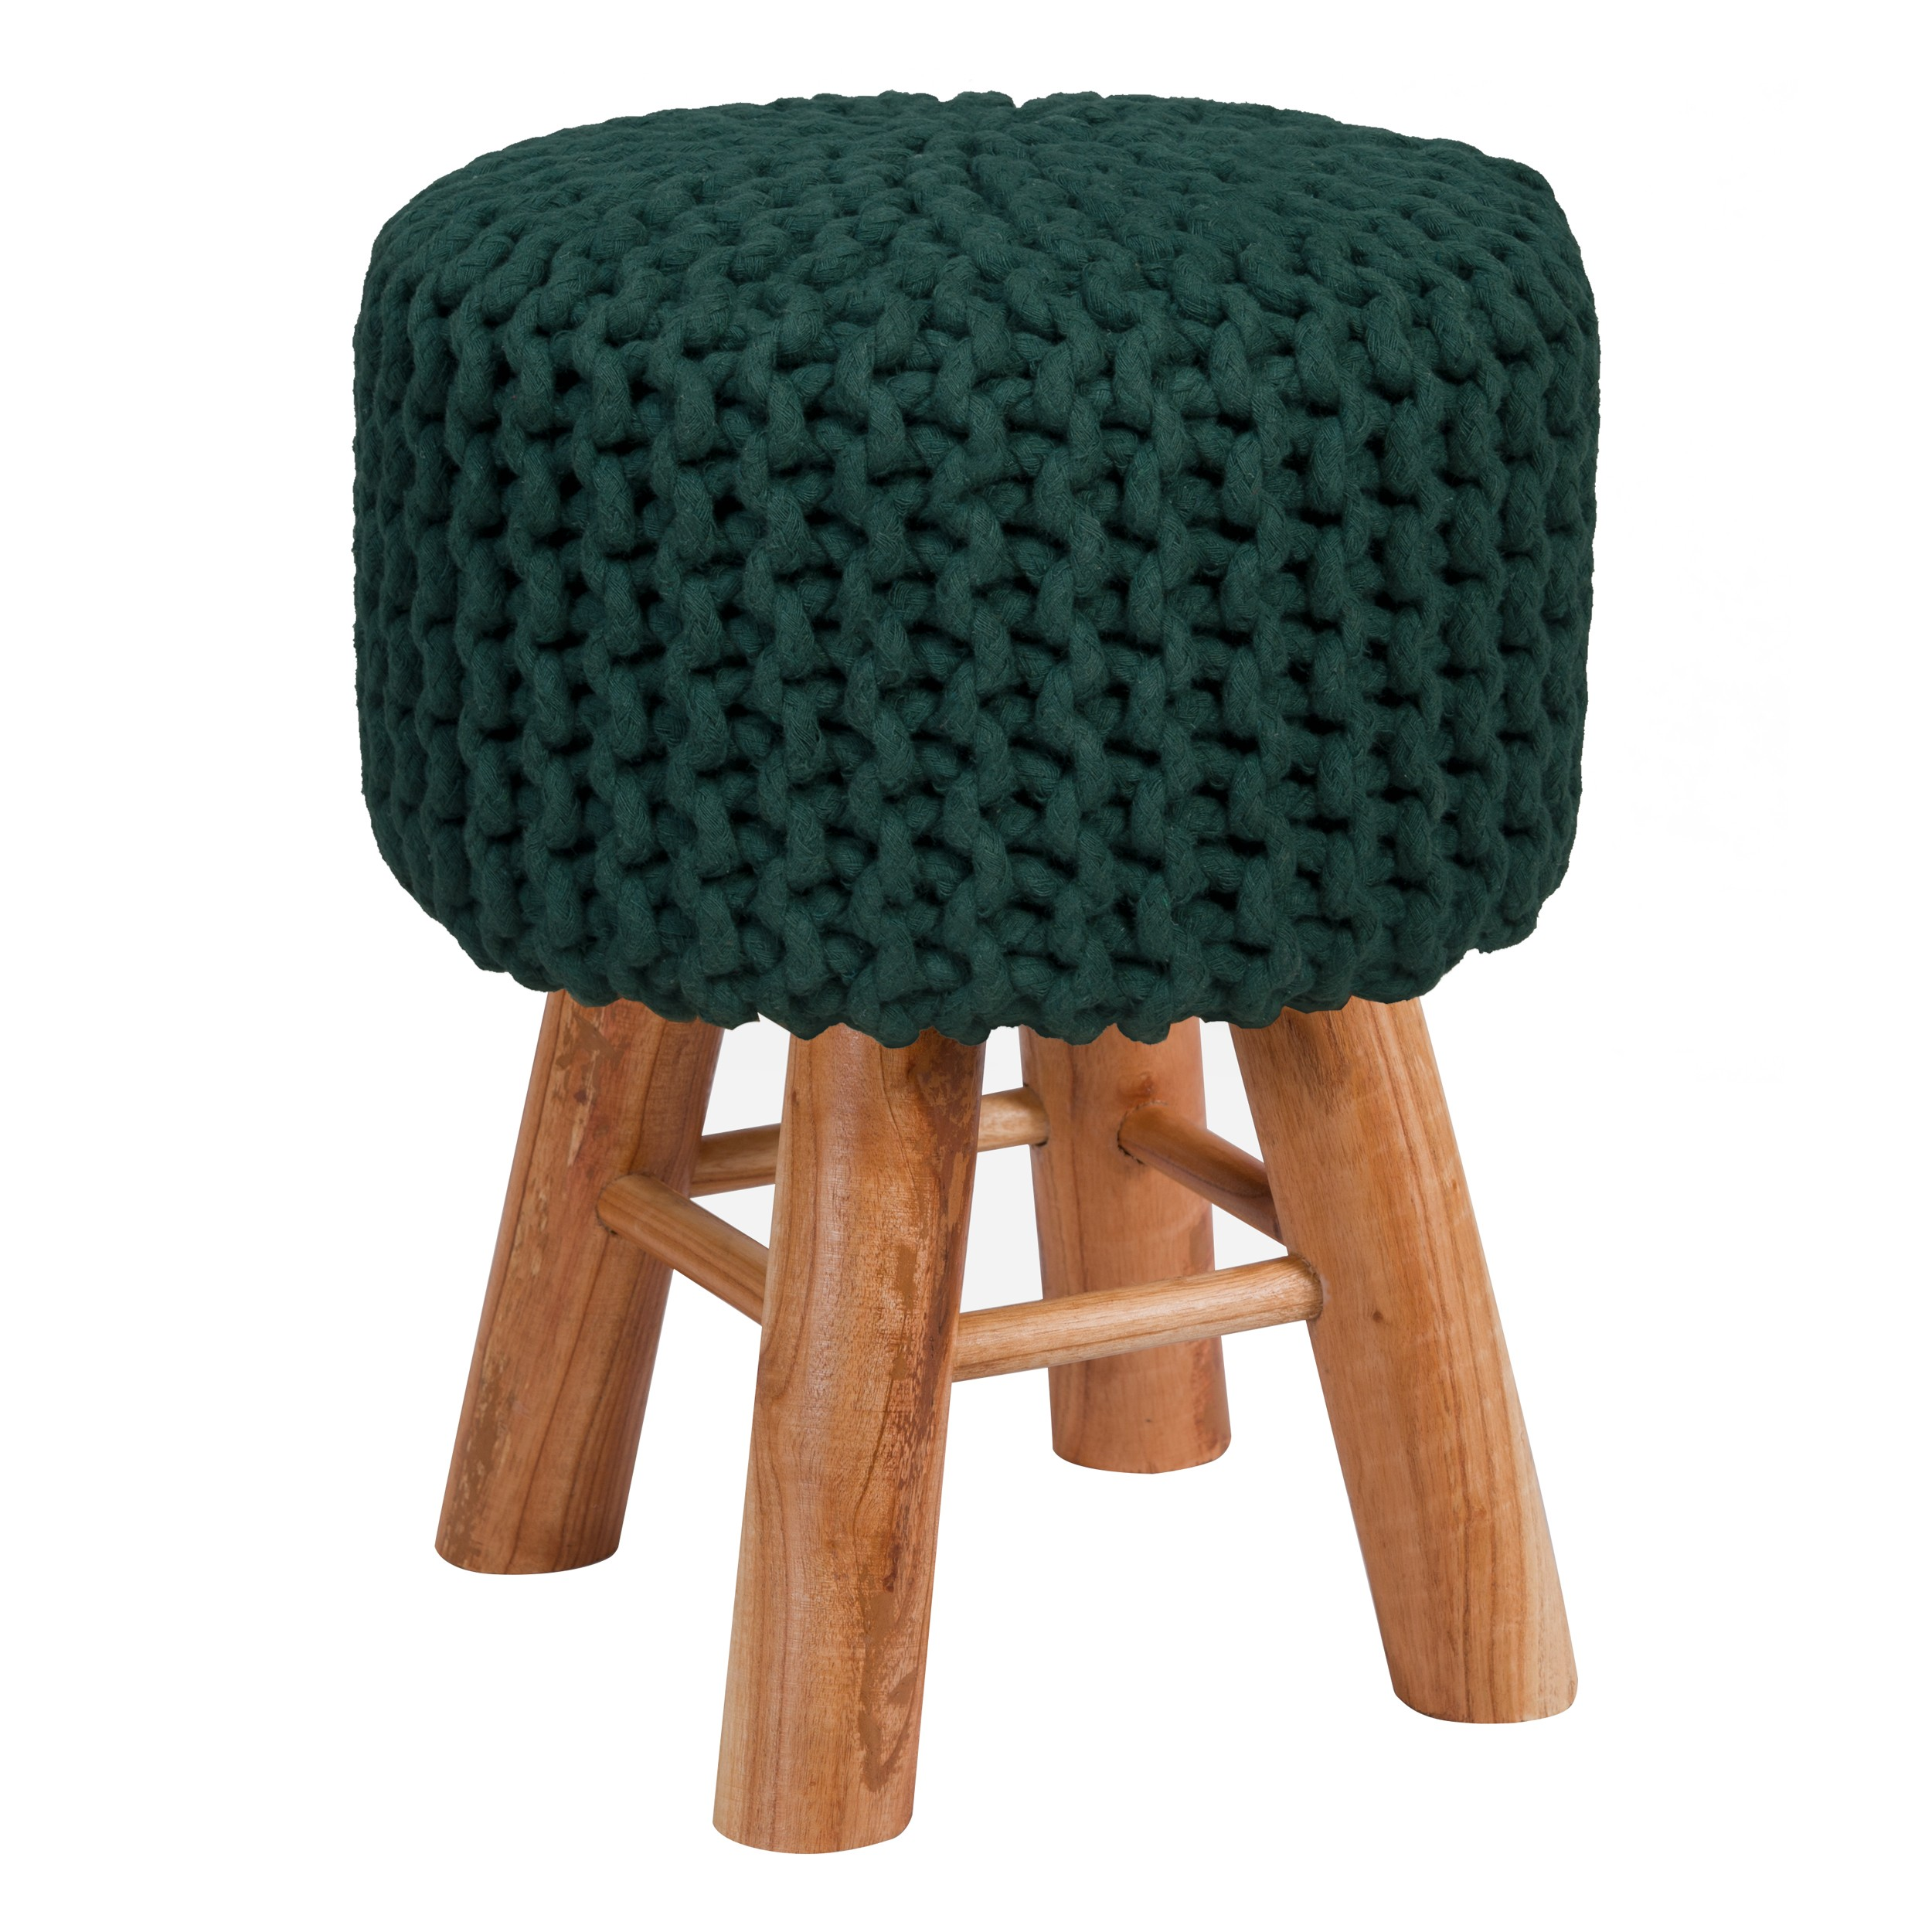 Cache Pied De Sapin Rotin tabouret tricot lisa vert sapin